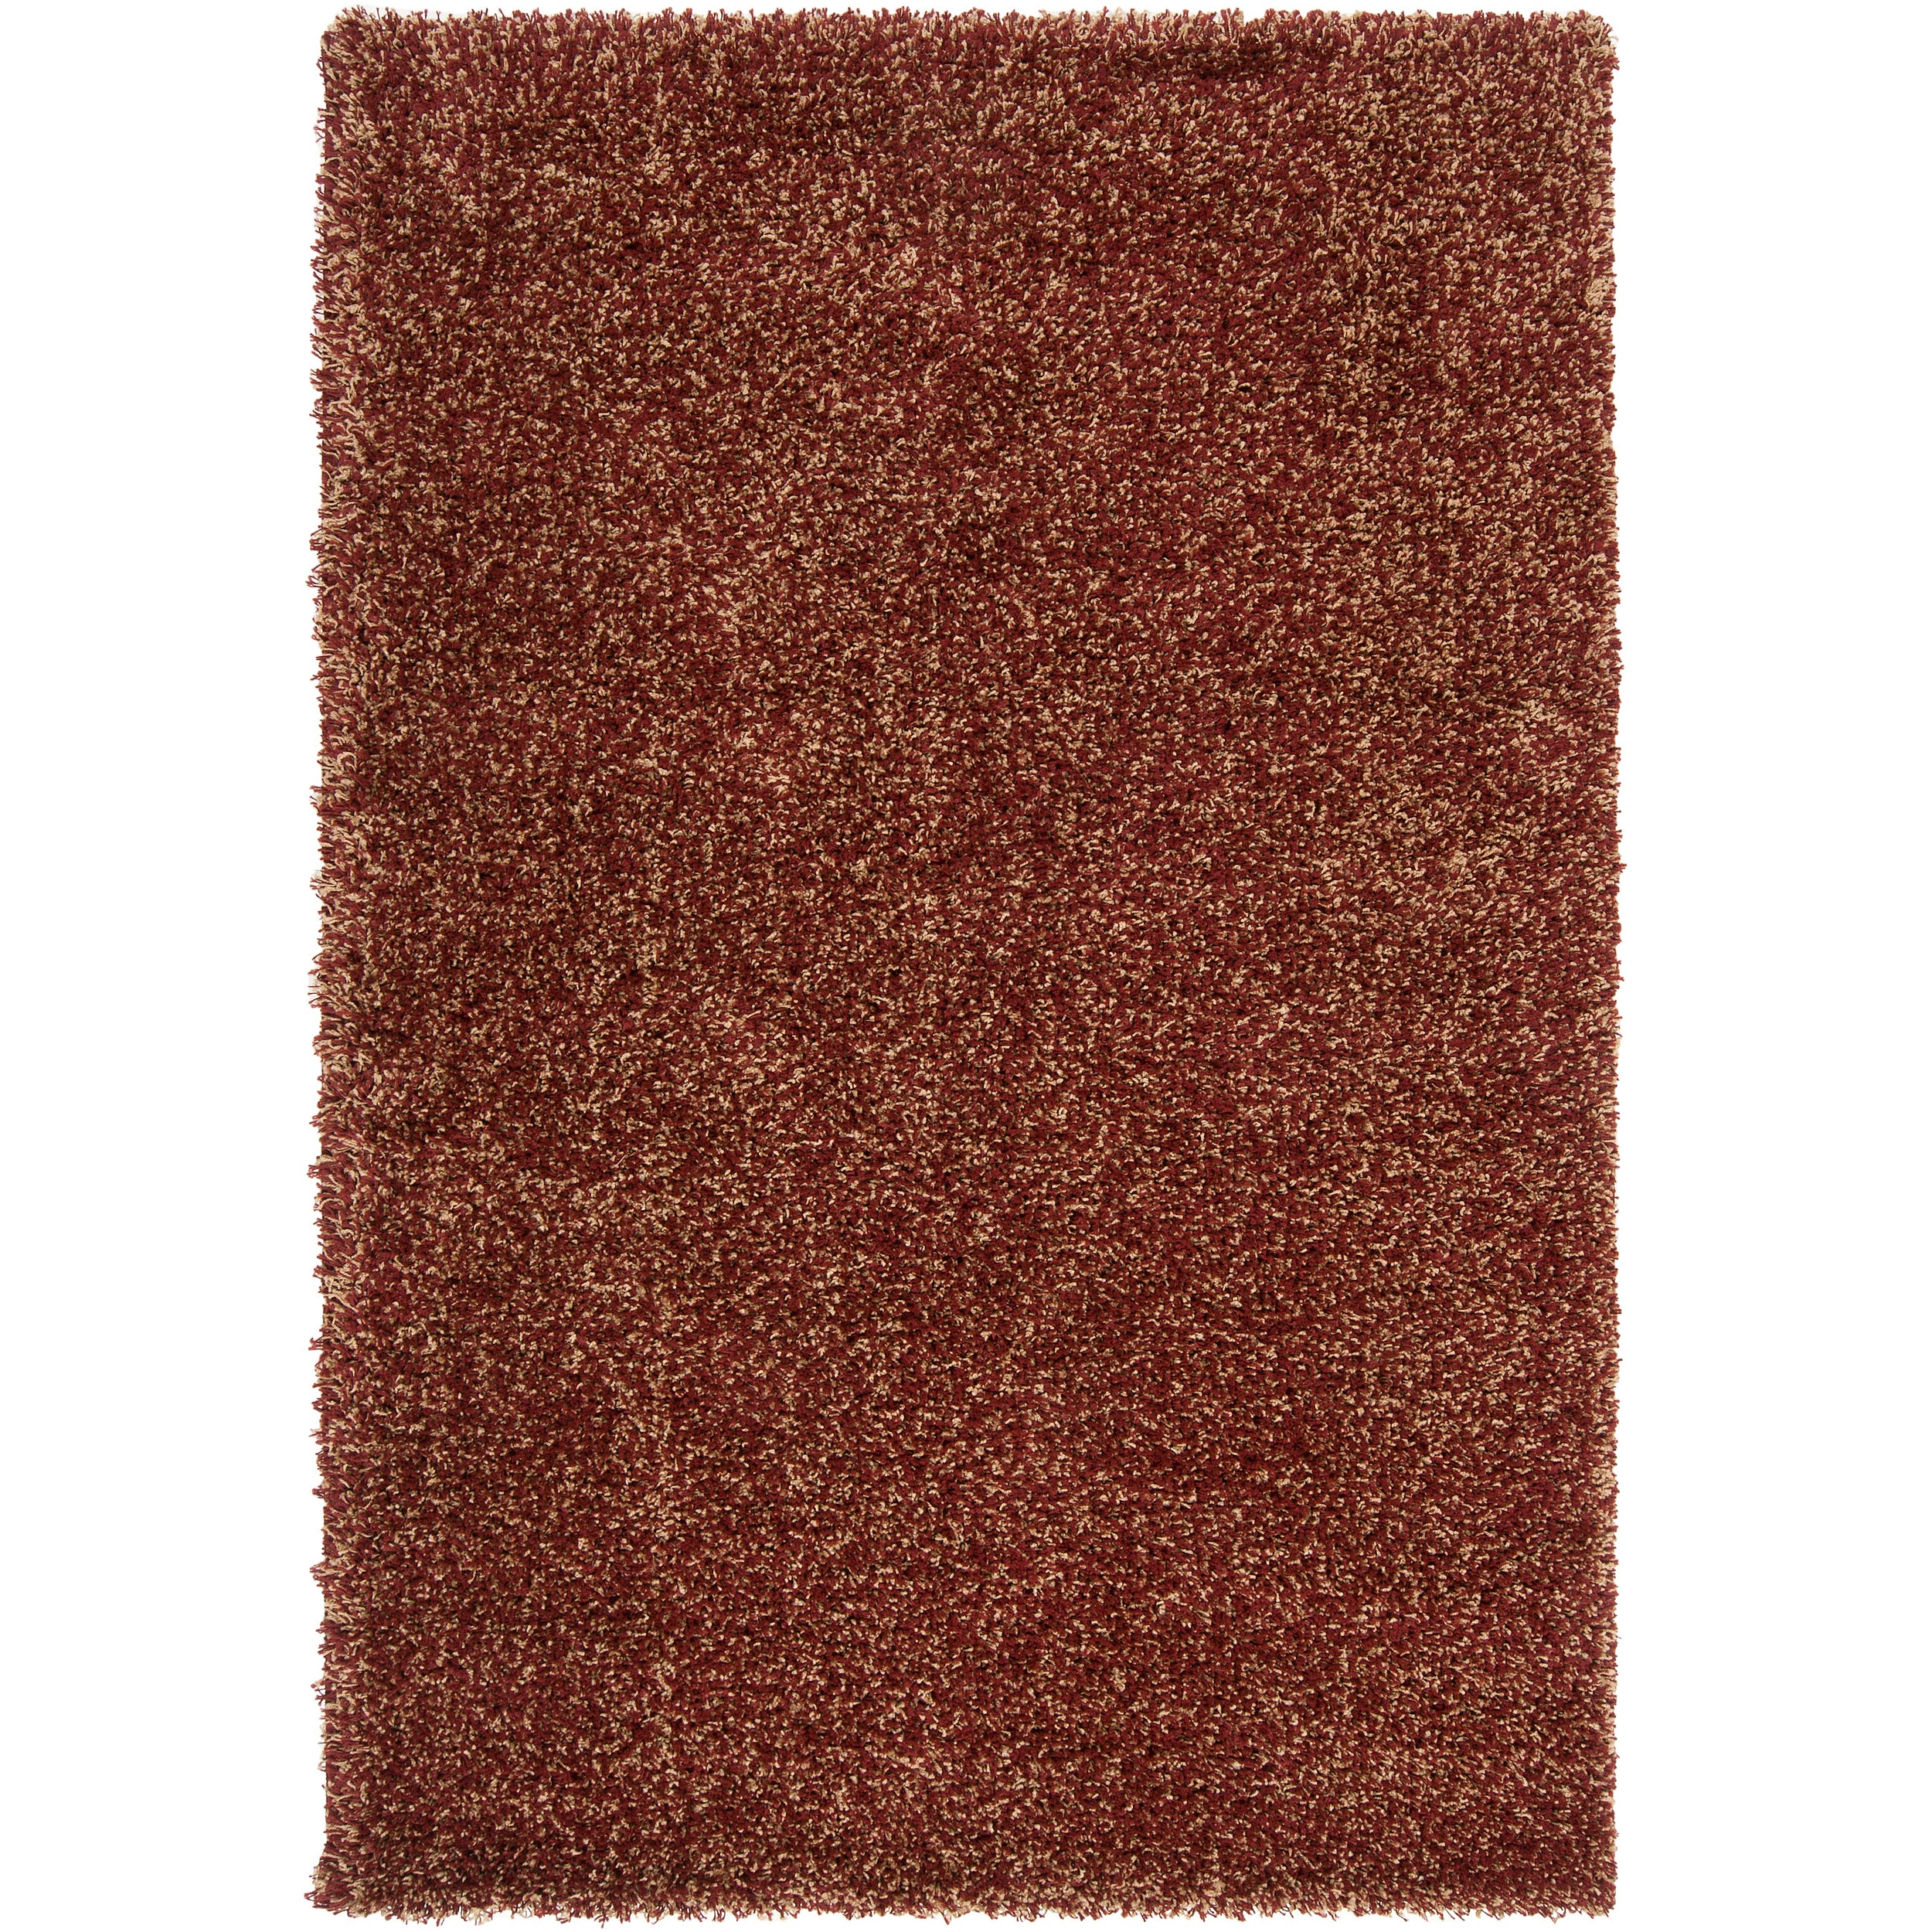 "Modern Woven Tan Luxurious Soft Shag Rug (5'3"" x 7'6"")"